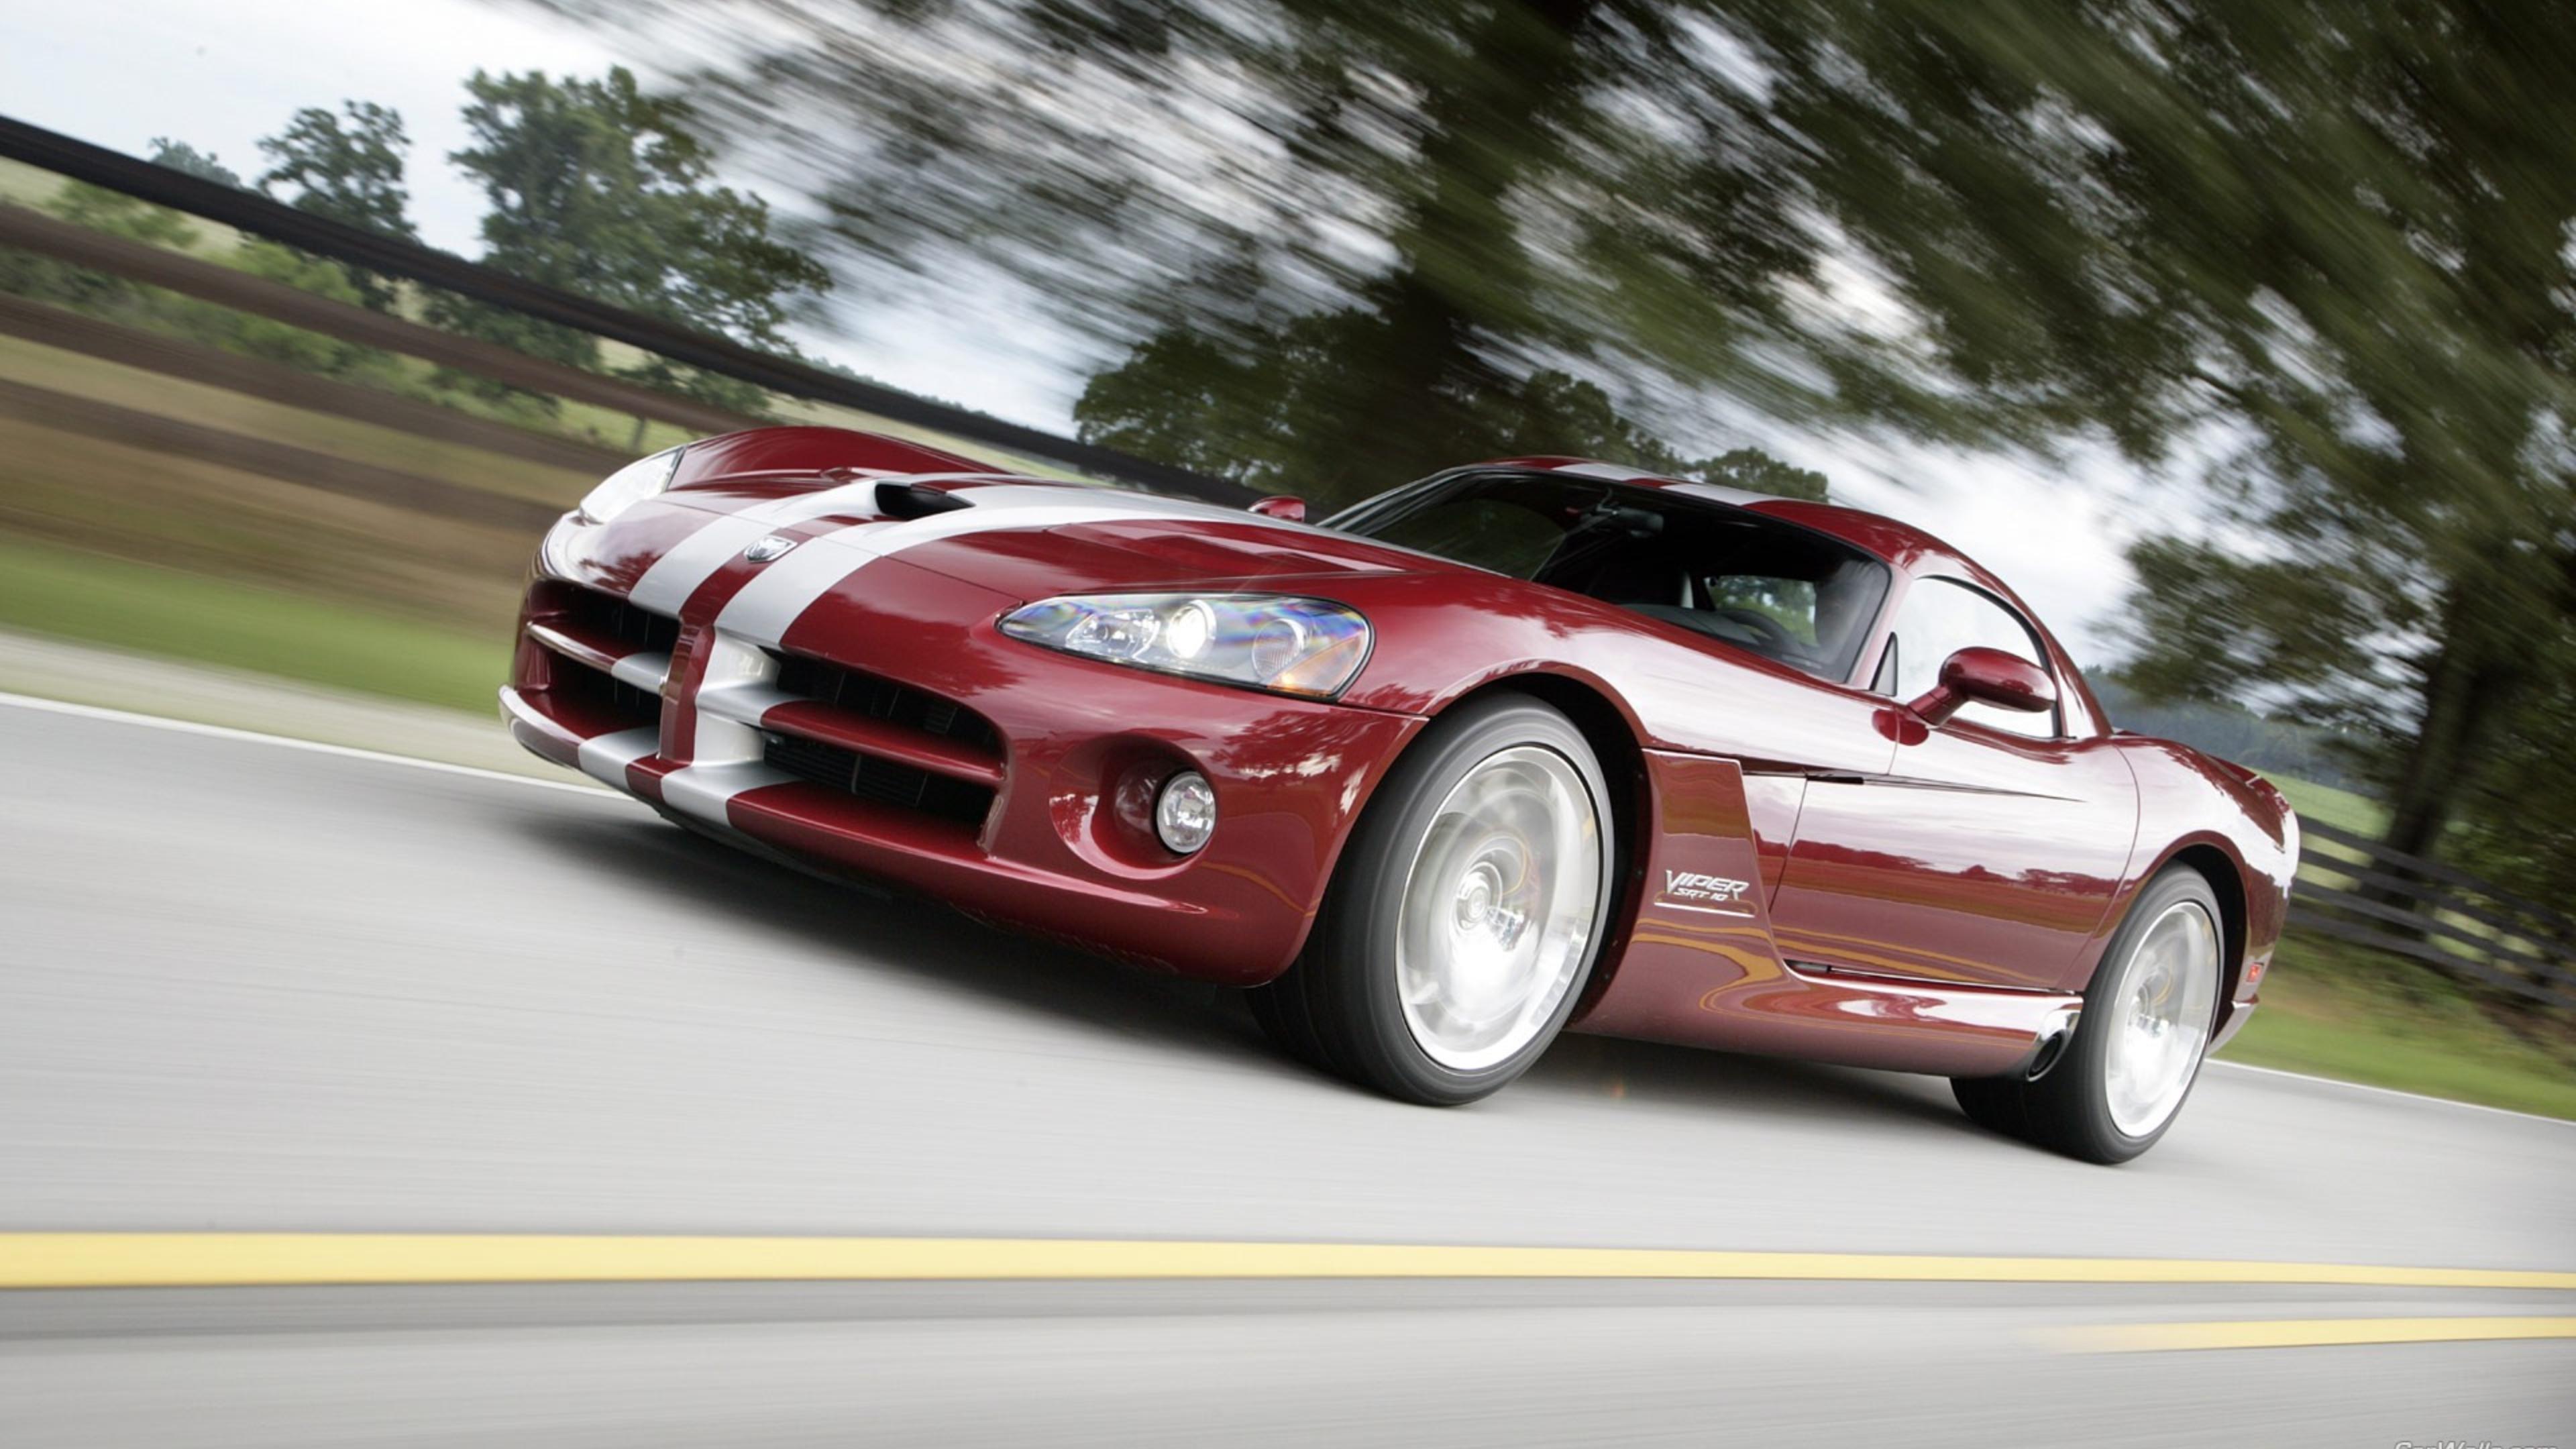 обои Samochody Dodge Tapety раздел машины размер 1920x1200 Hd